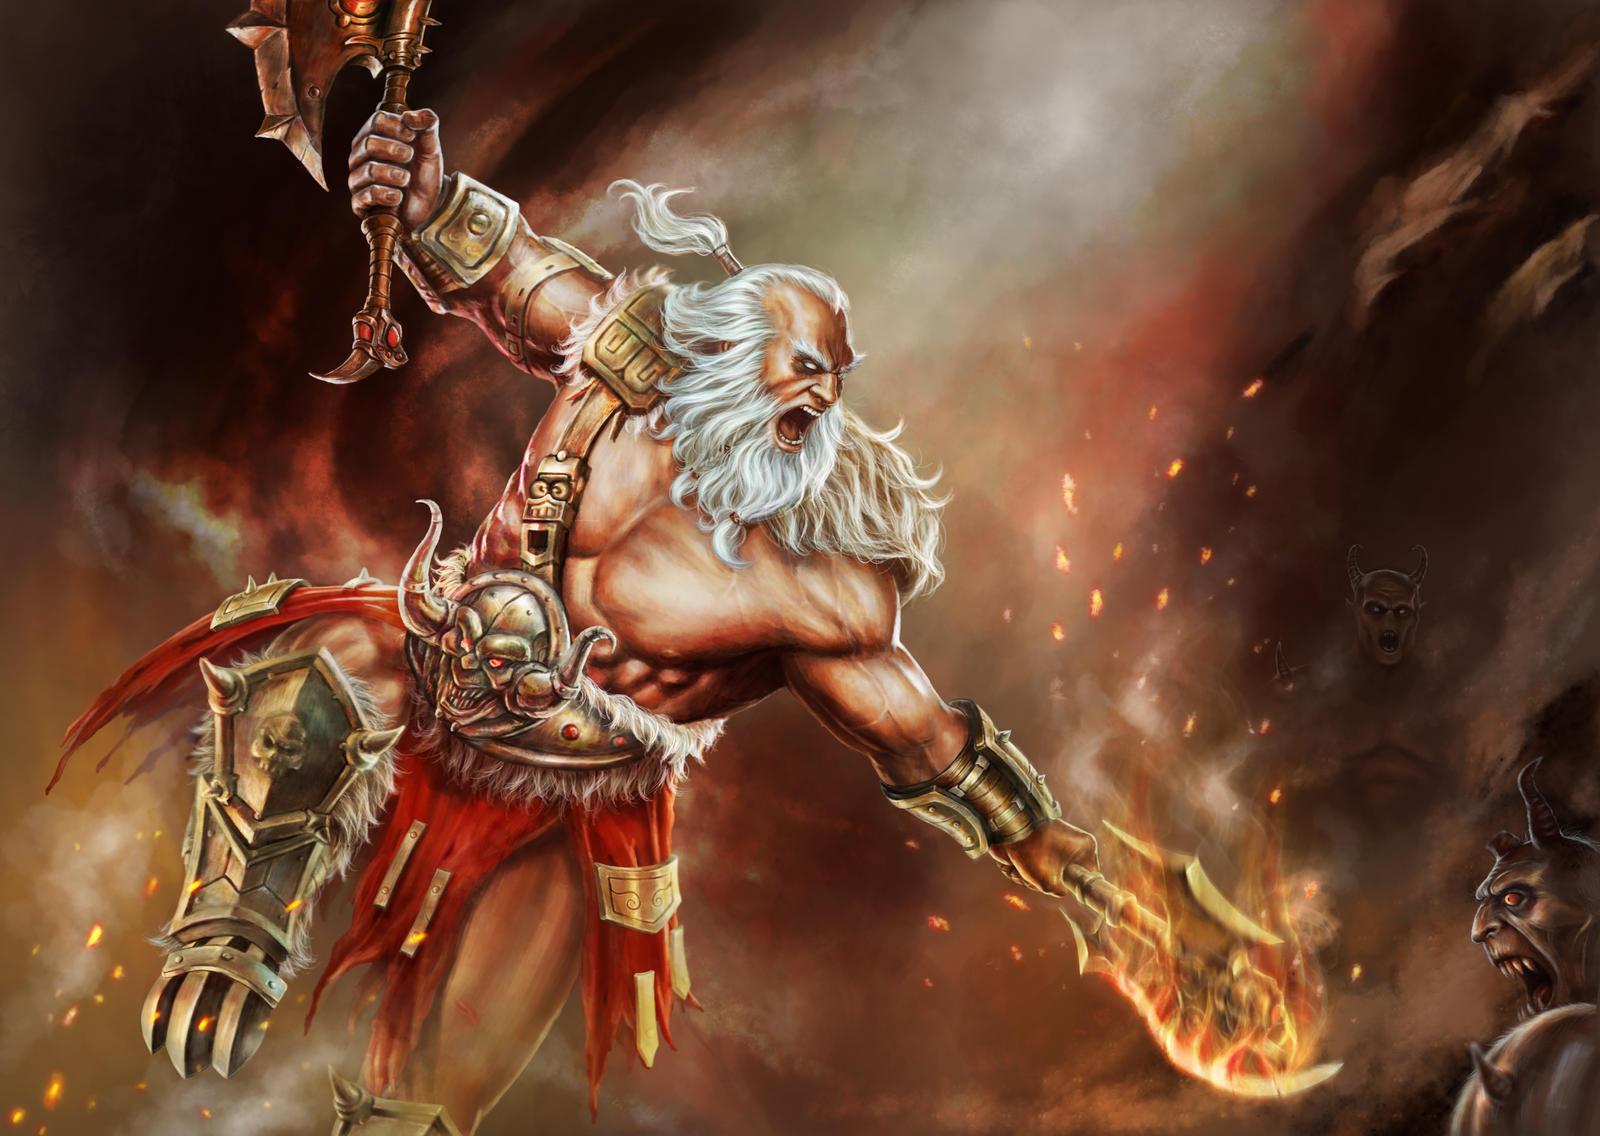 the_barbarian___diablo_iii_contest_entry_by_leemarej-d7a0225.jpg